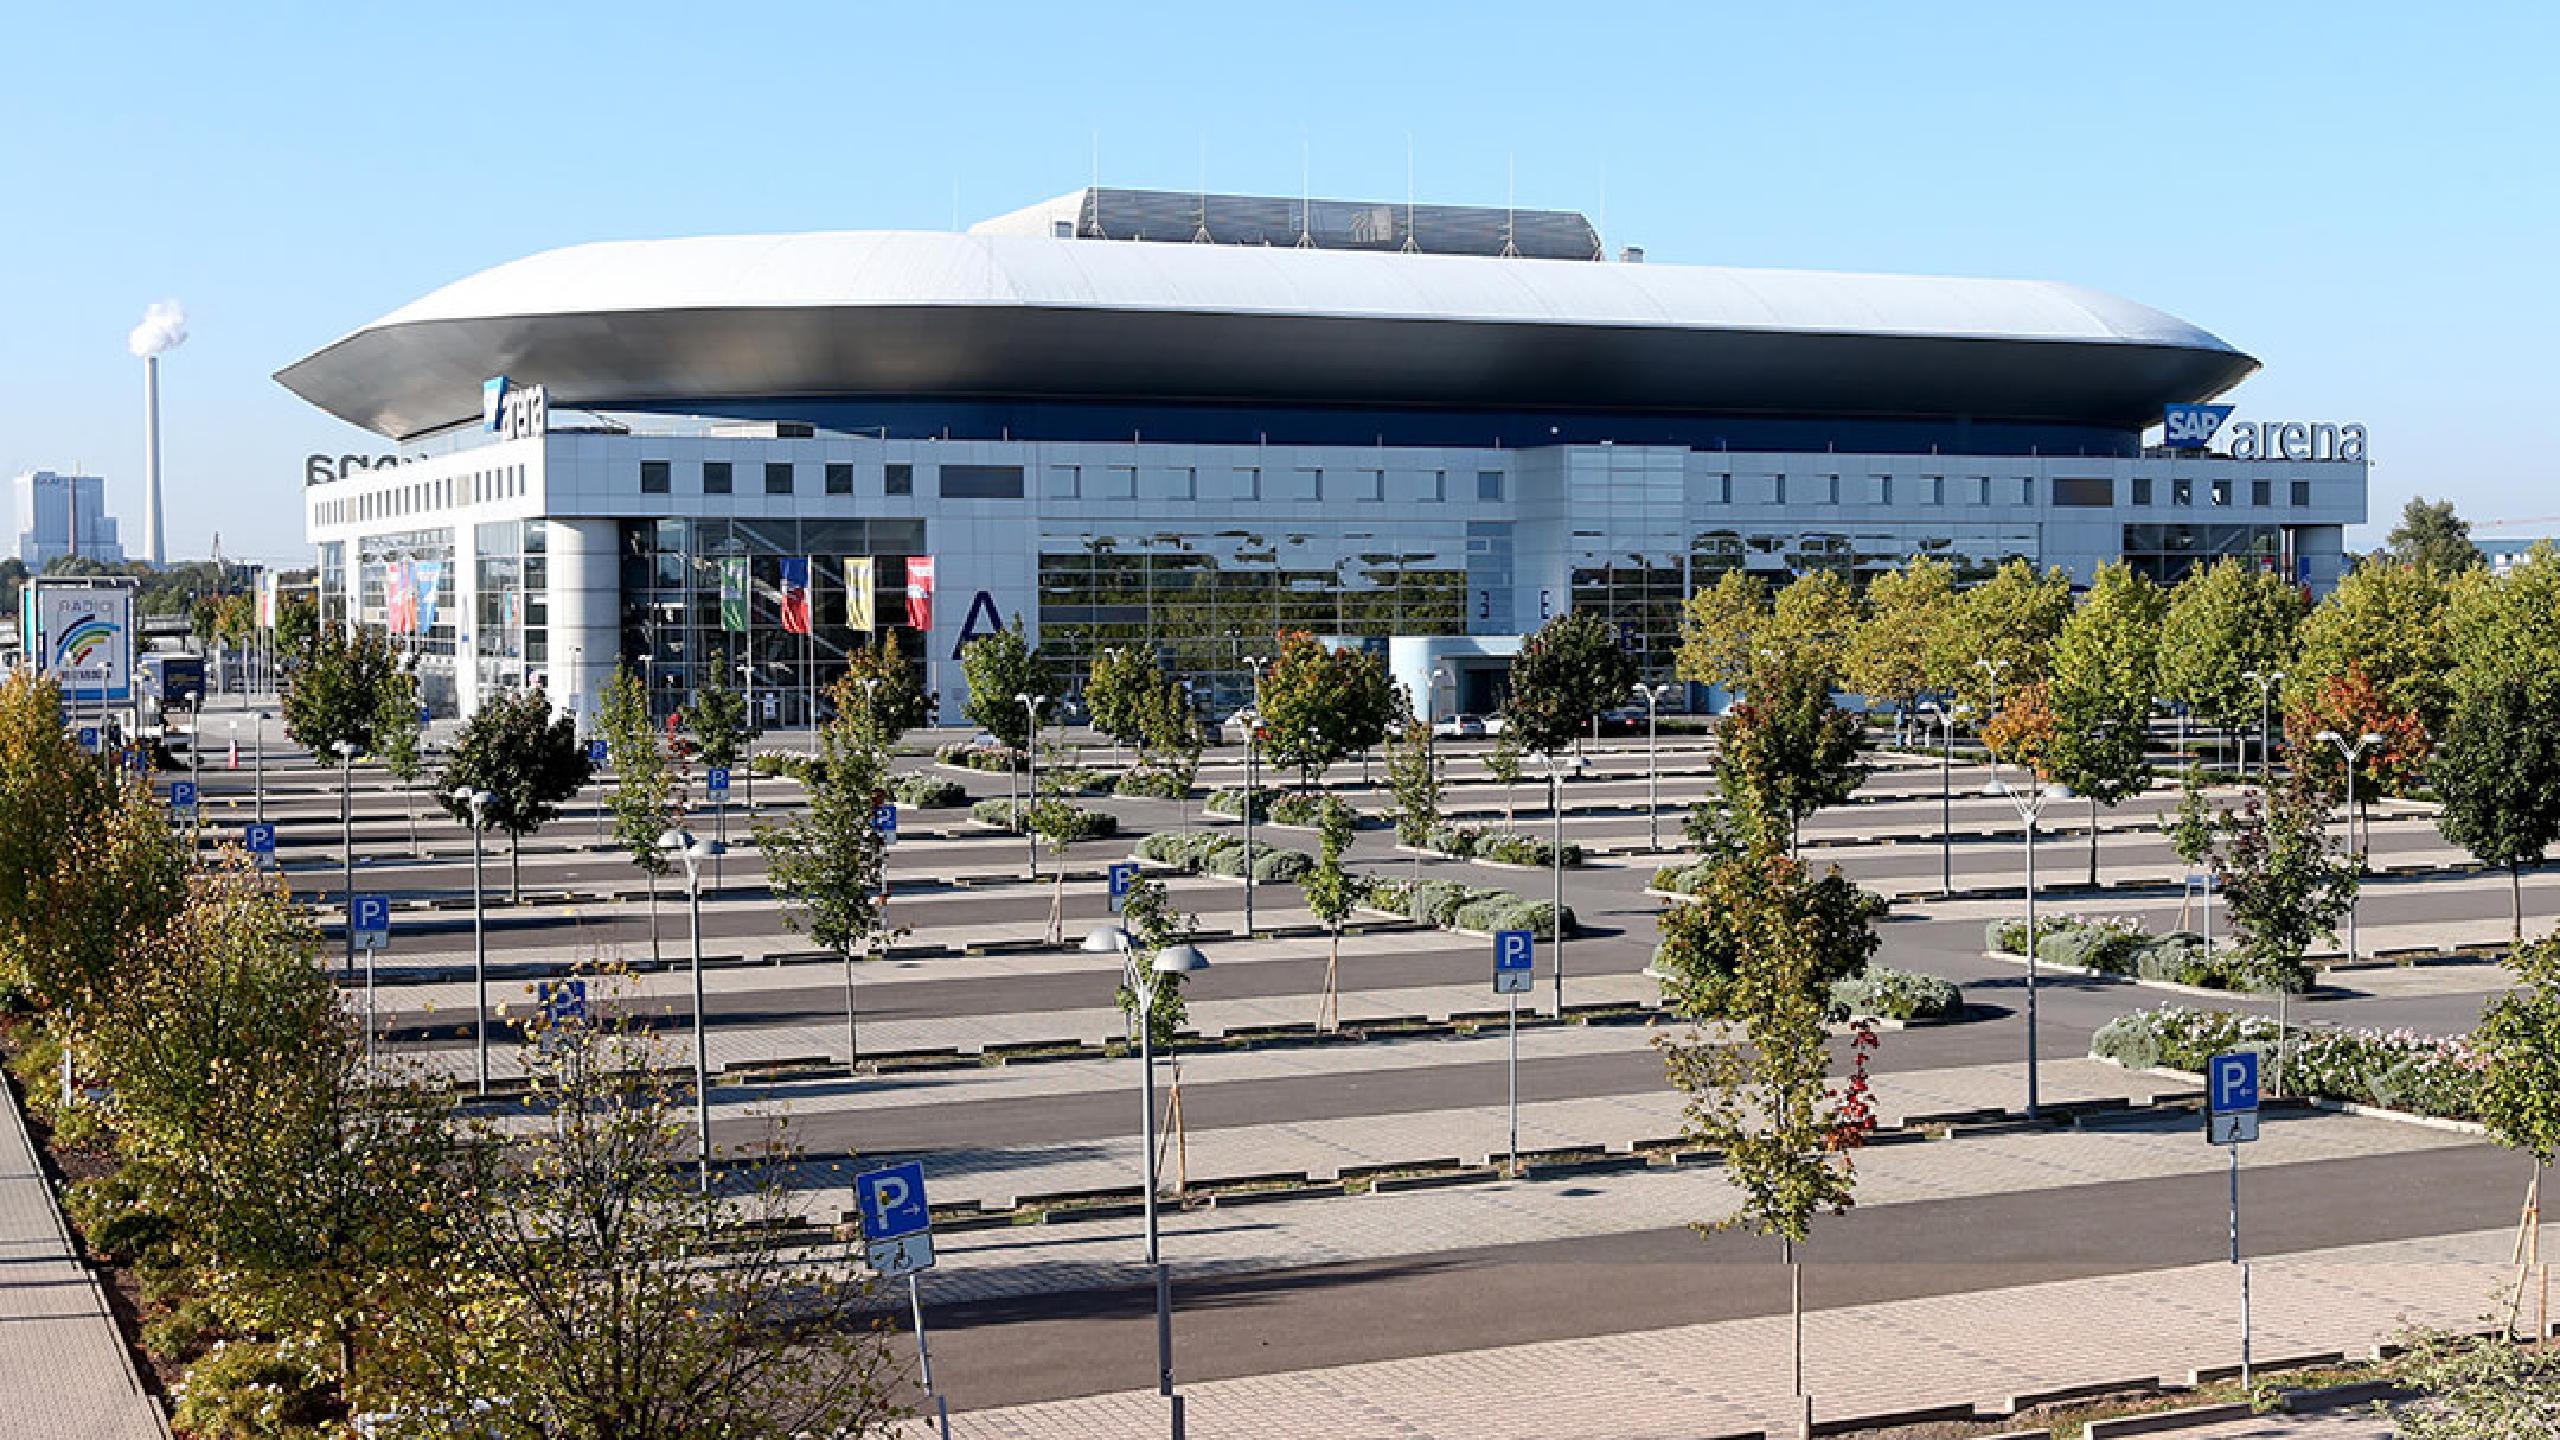 Sap arena tickets